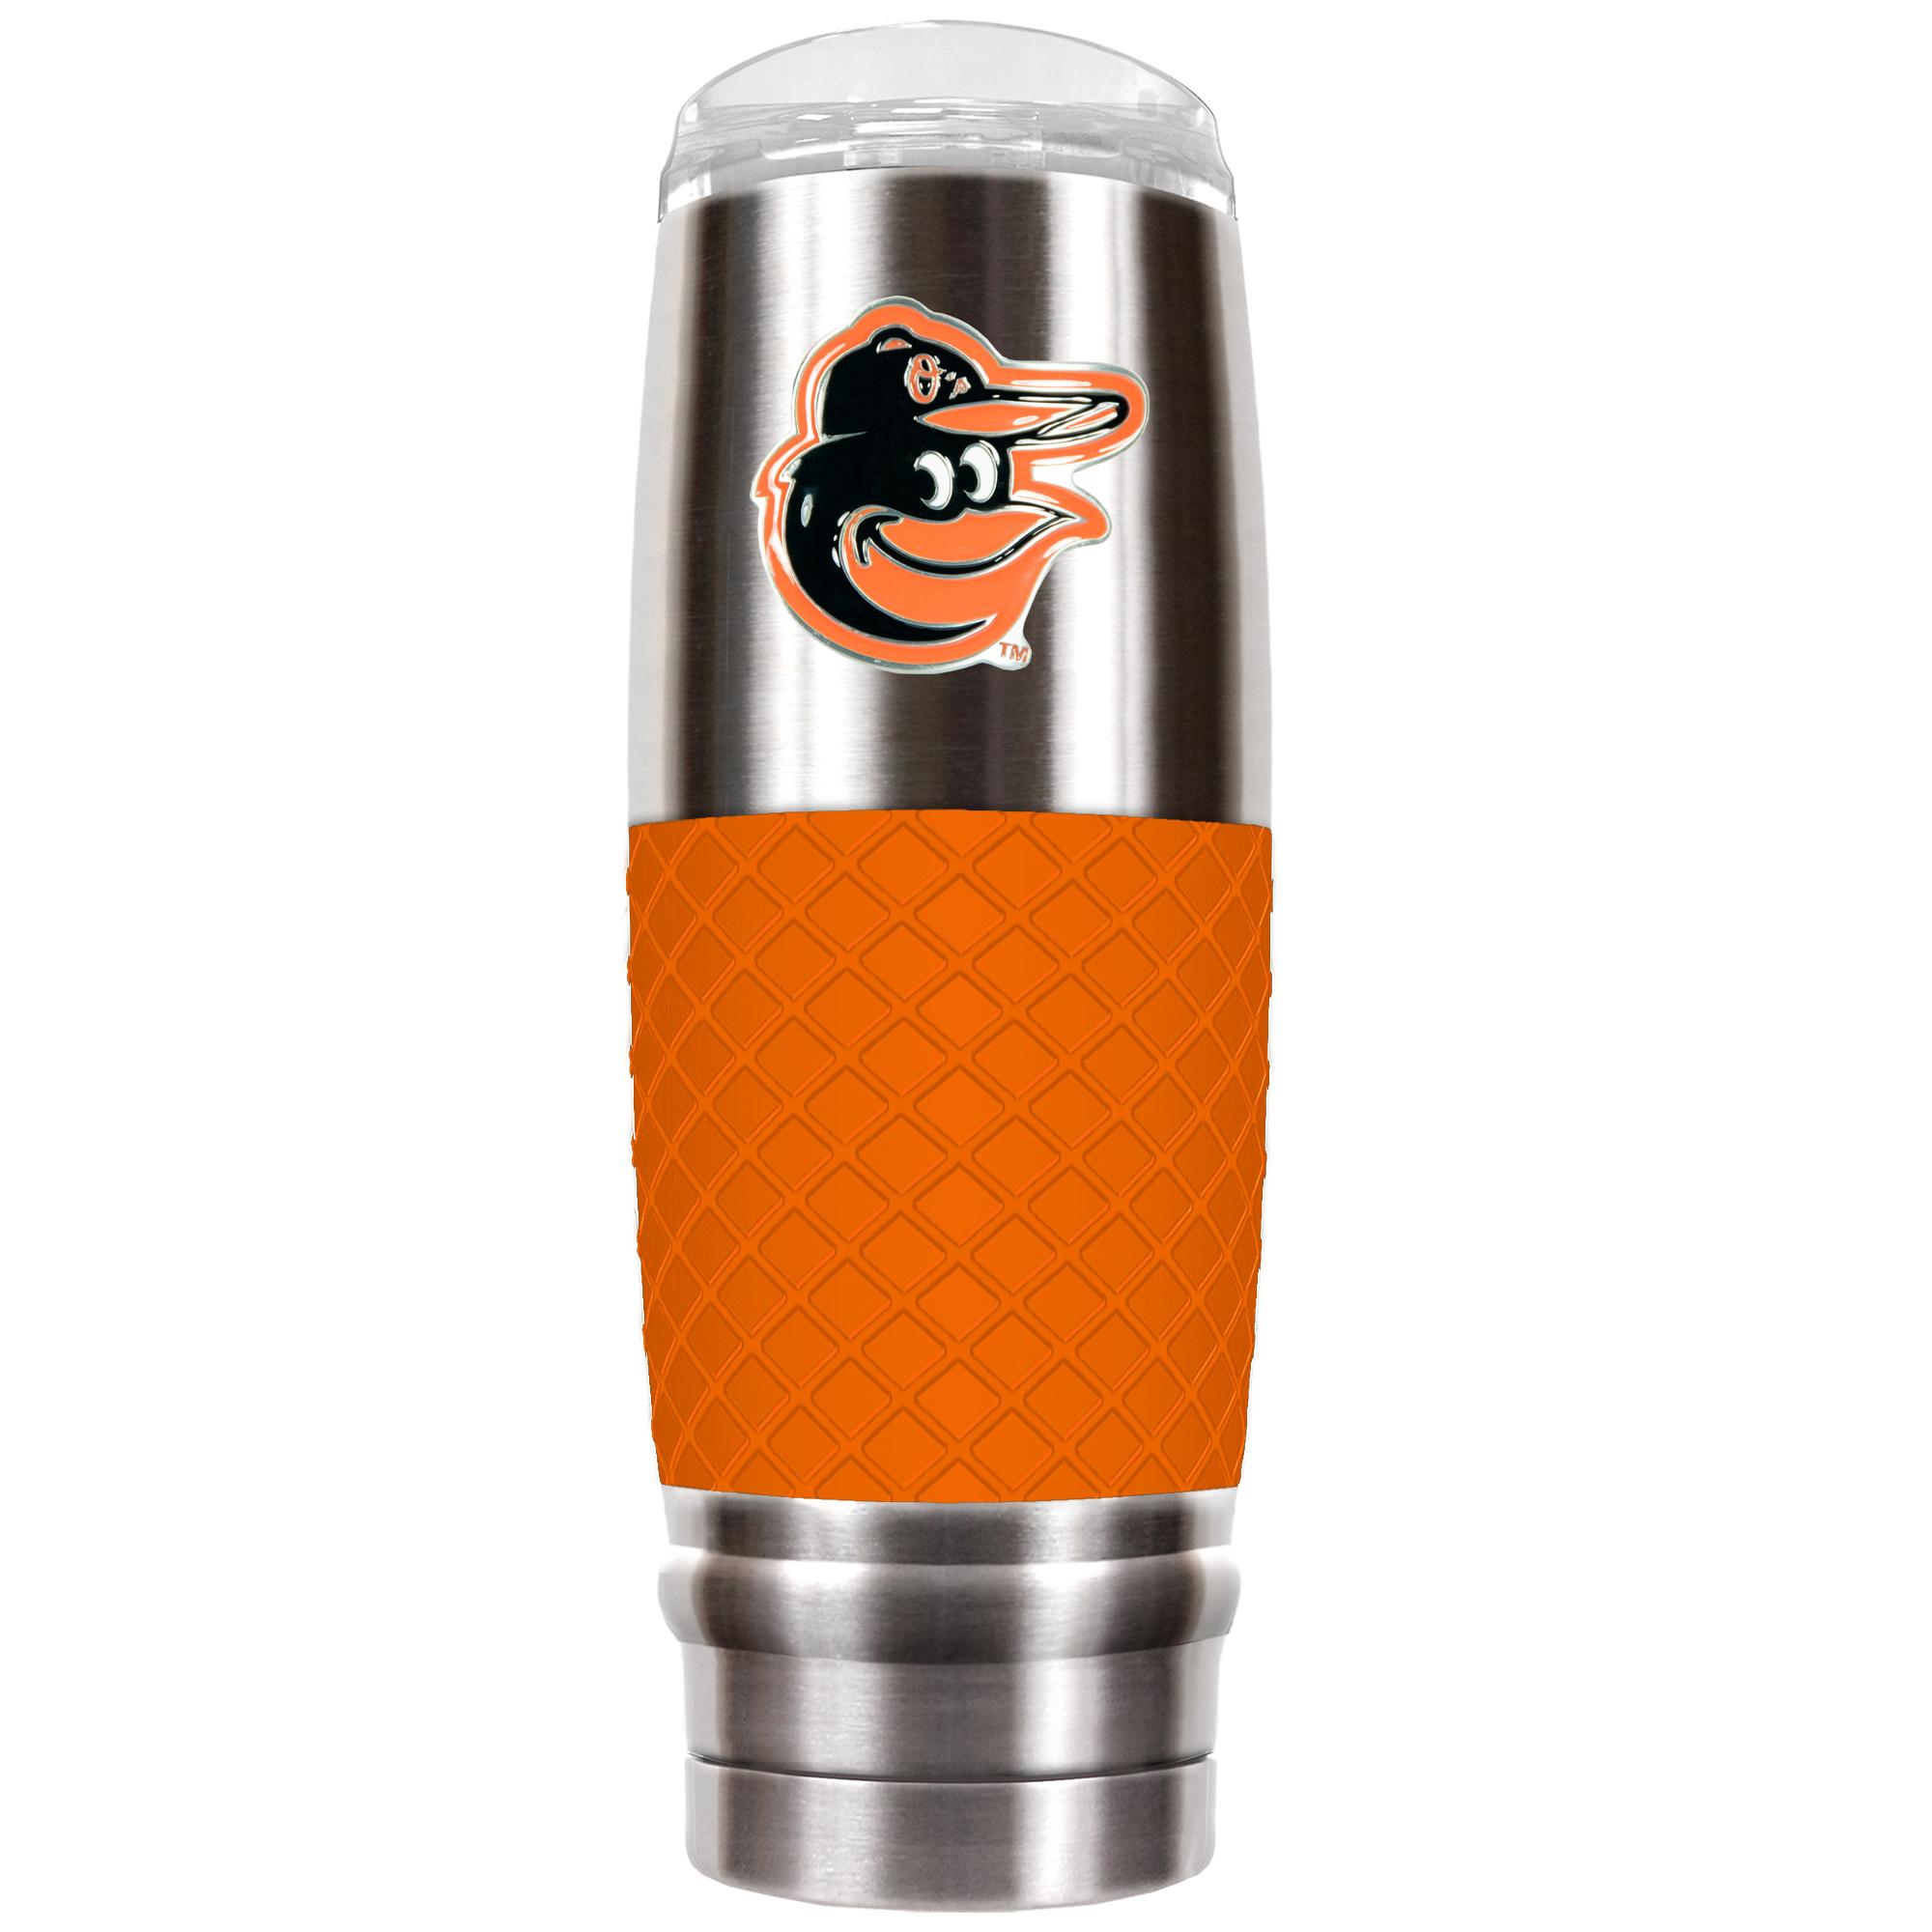 Baltimore Orioles 30oz. The Reserve Vacuum-Insulated Travel Tumbler - Orange - No Size